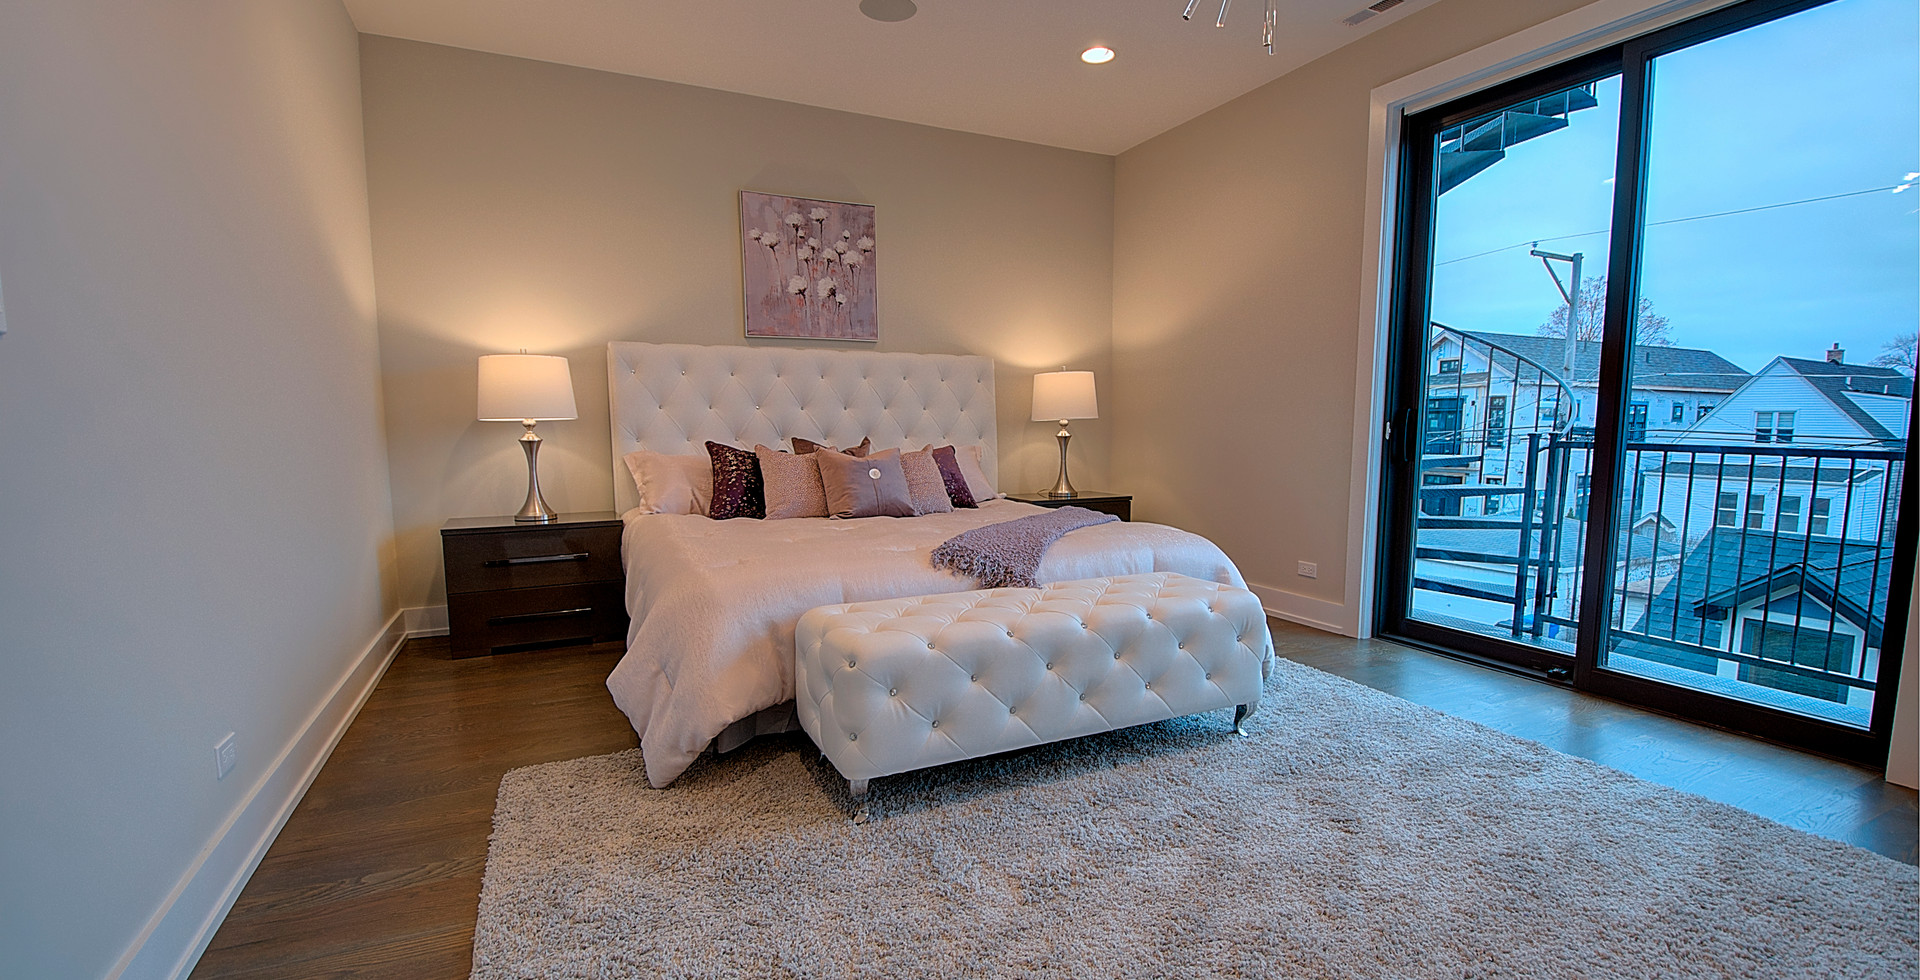 Bedroom in Westmont designed by MRM Home Design.jpg